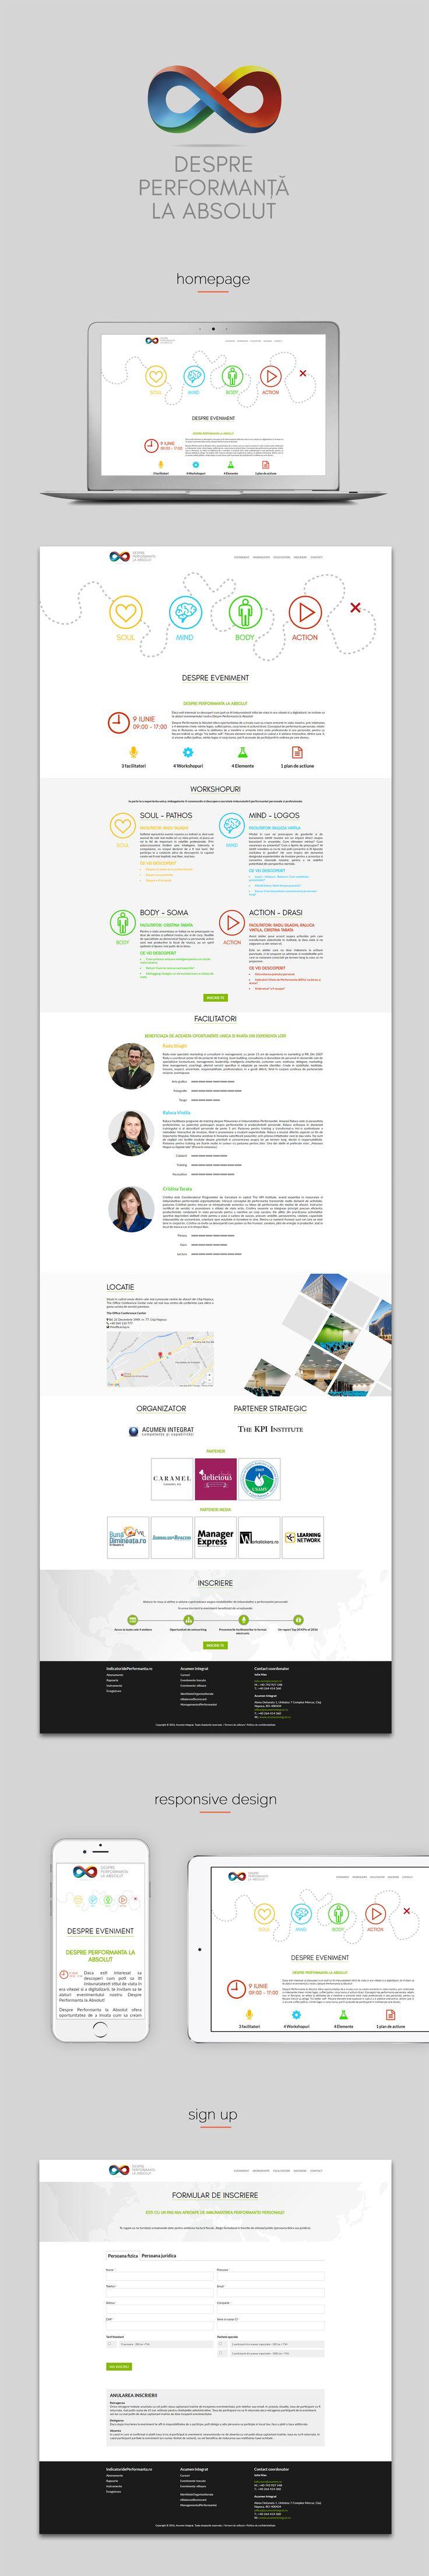 Despre Performanta la Absolut, webdesign with responsive design.